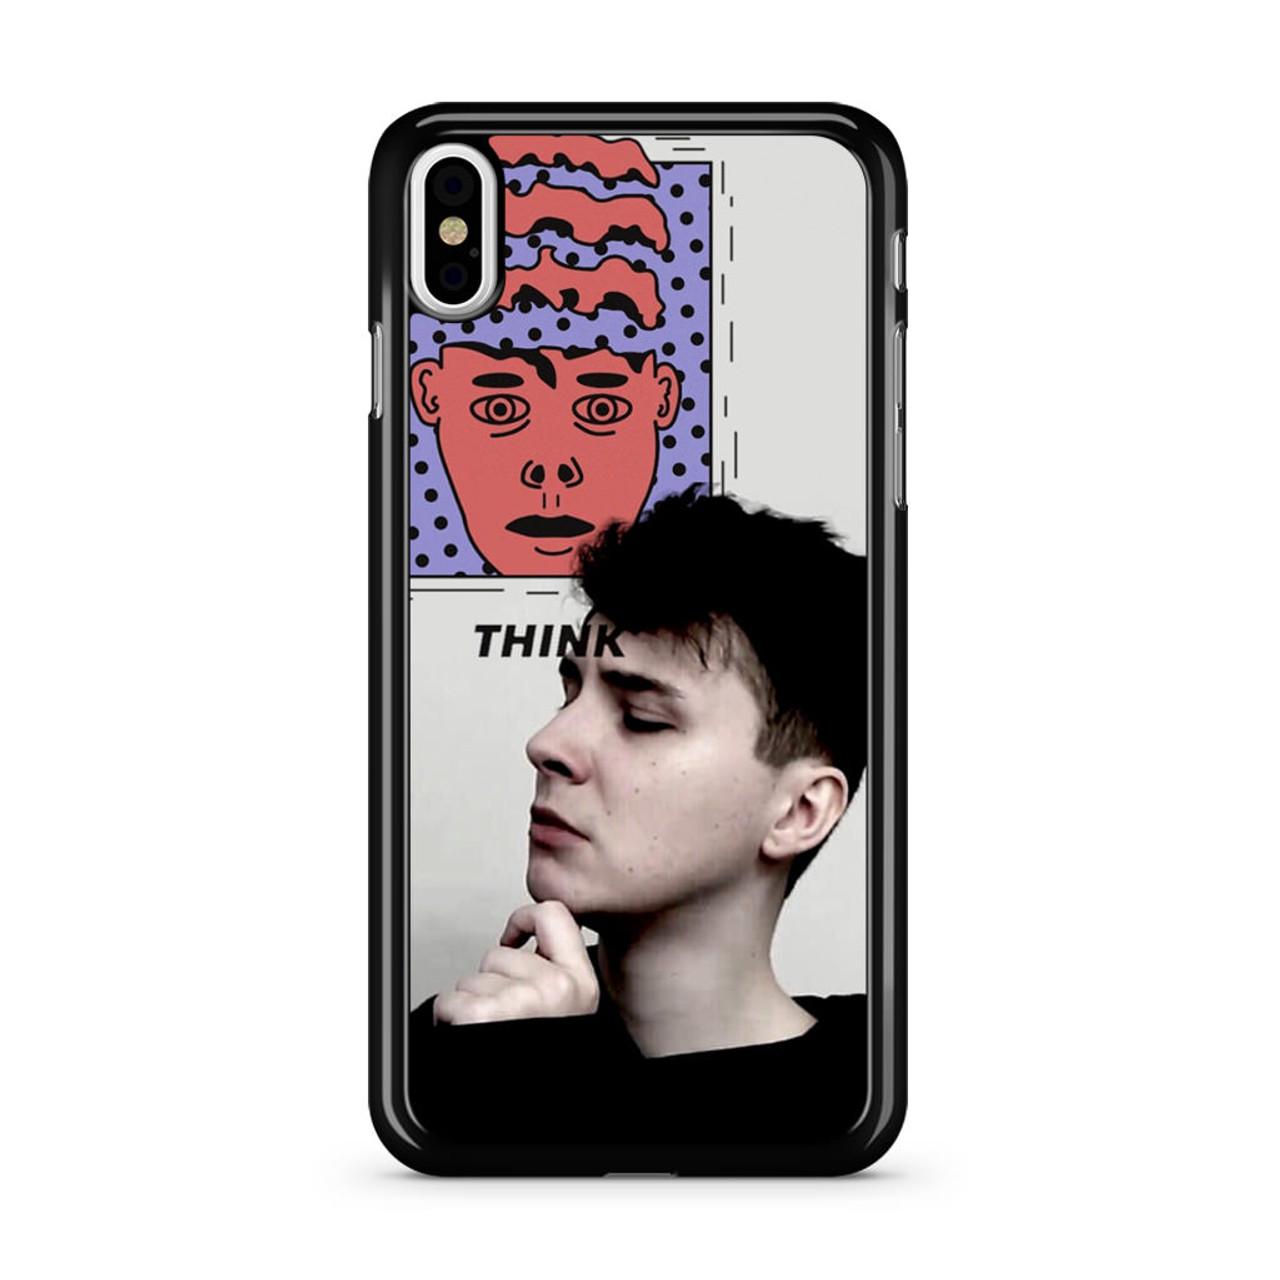 thik iphone 6 case